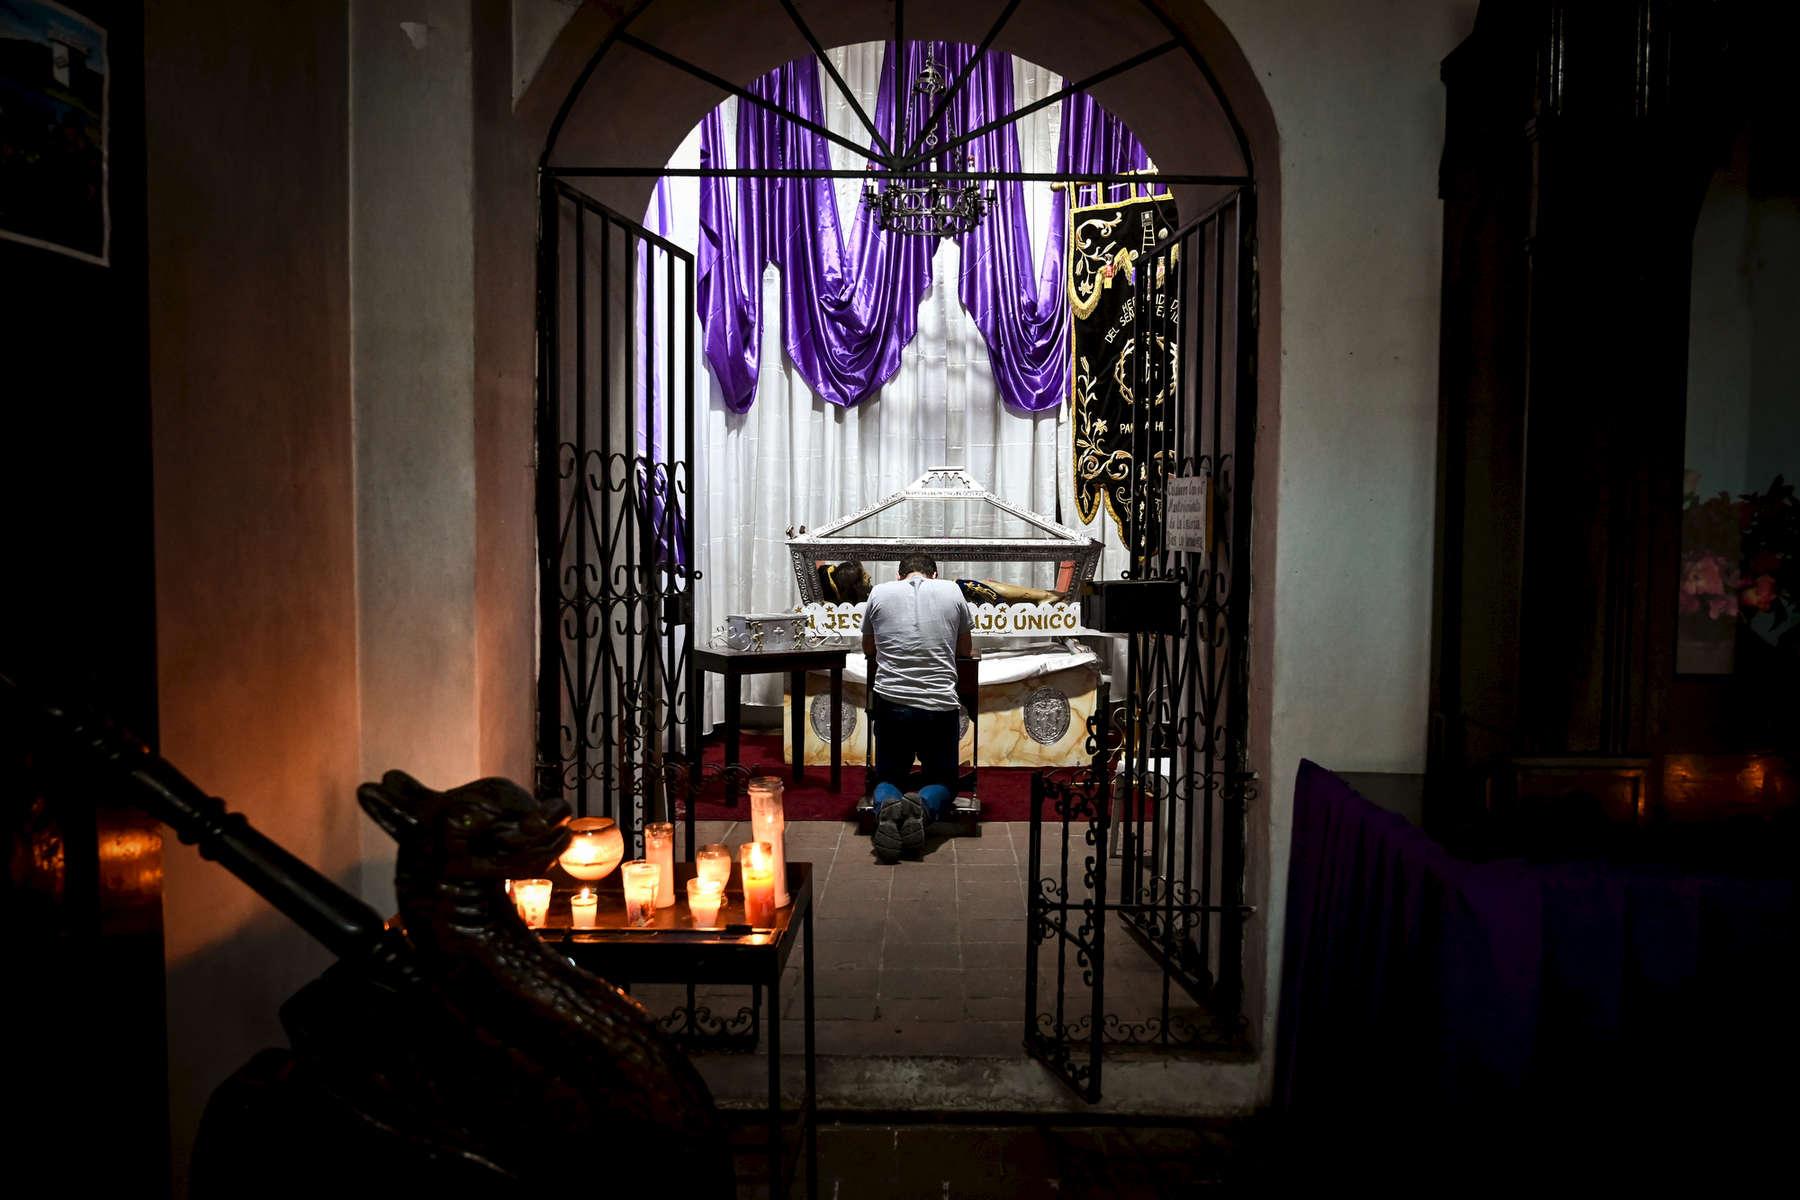 A man prays at the Catholic Church on April 18, 2019.